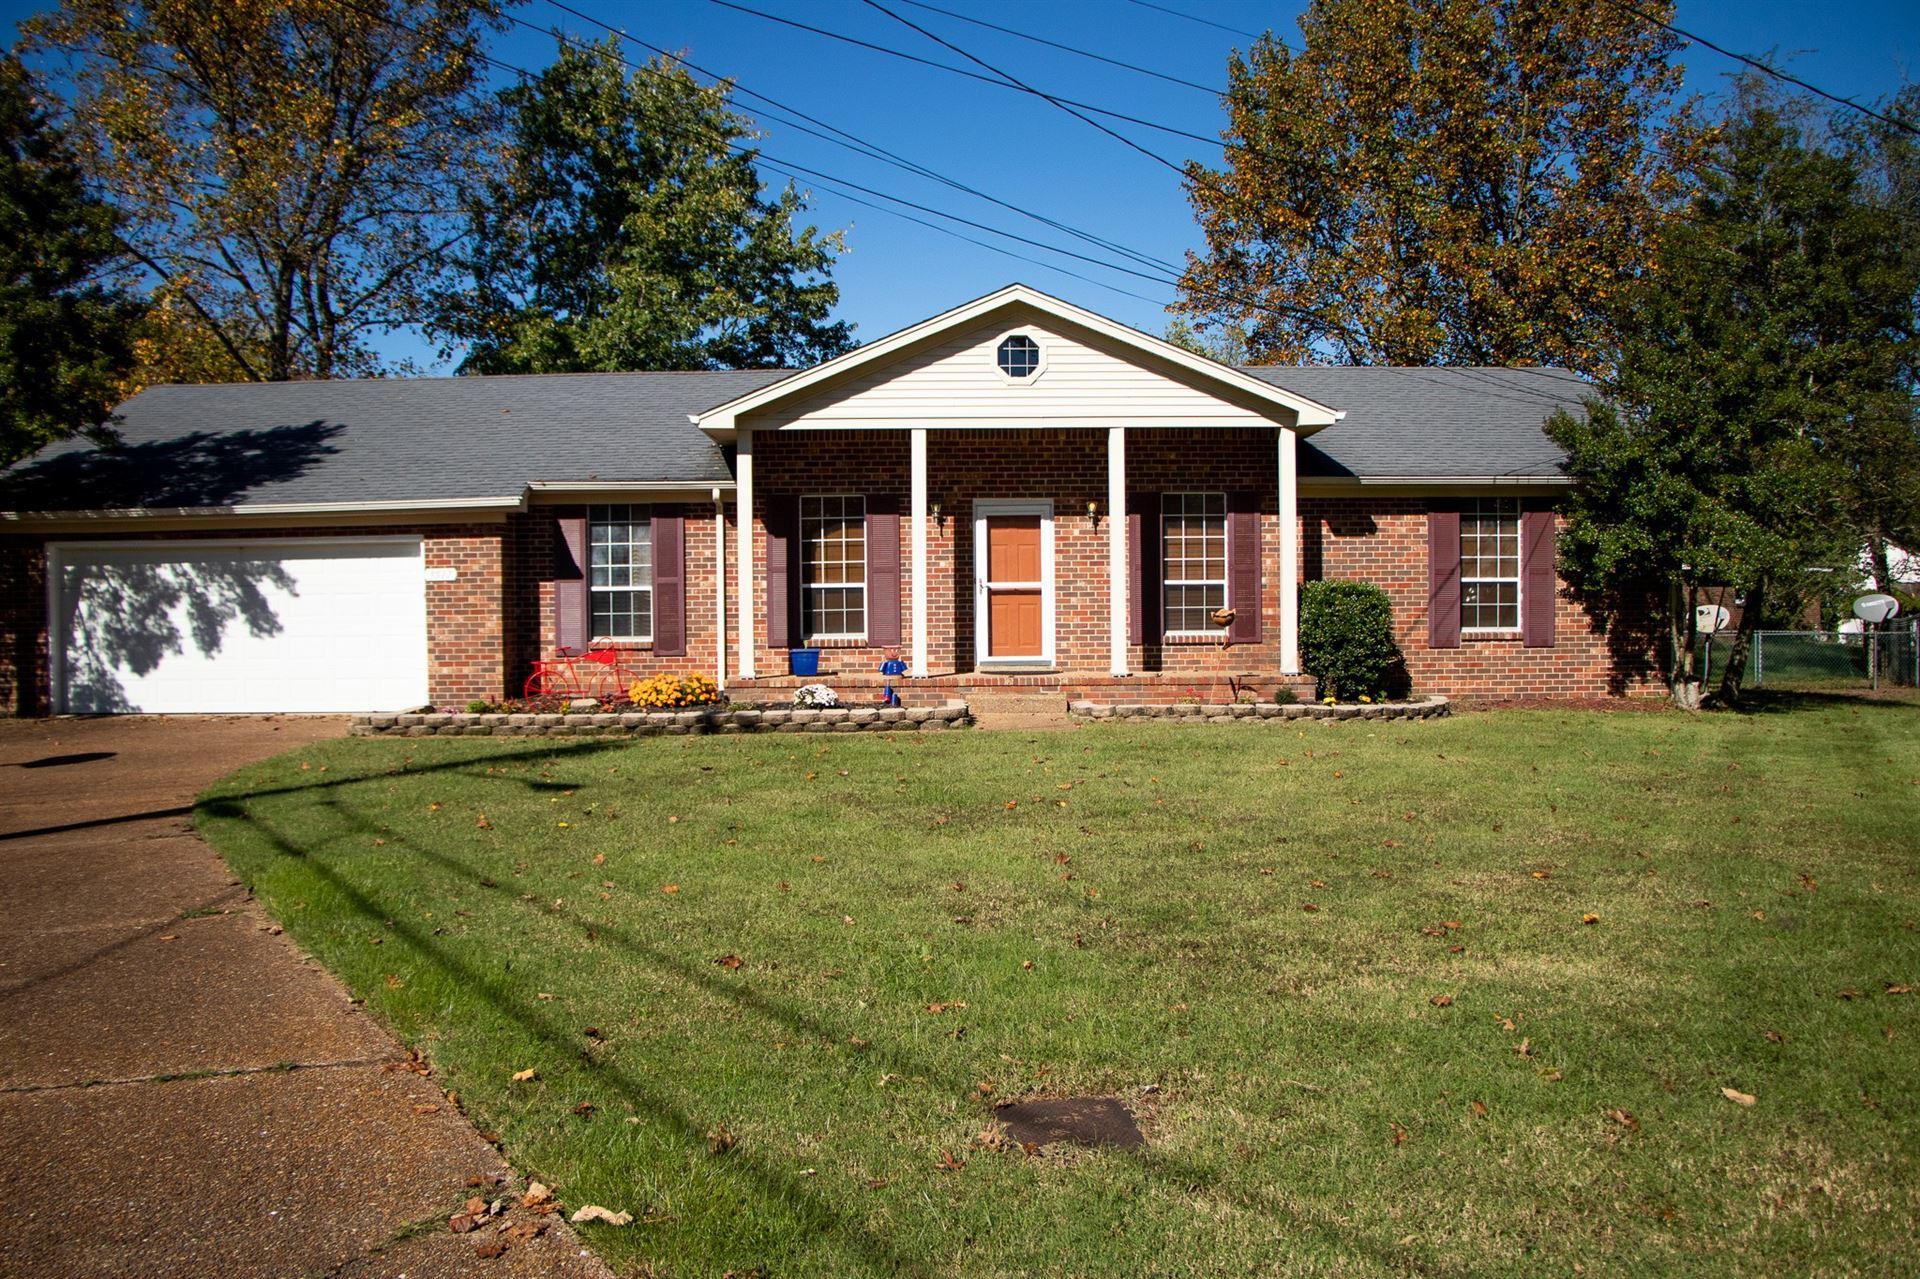 3517 Saxon Mist Ct, Nashville, TN 37217 - MLS#: 2197735